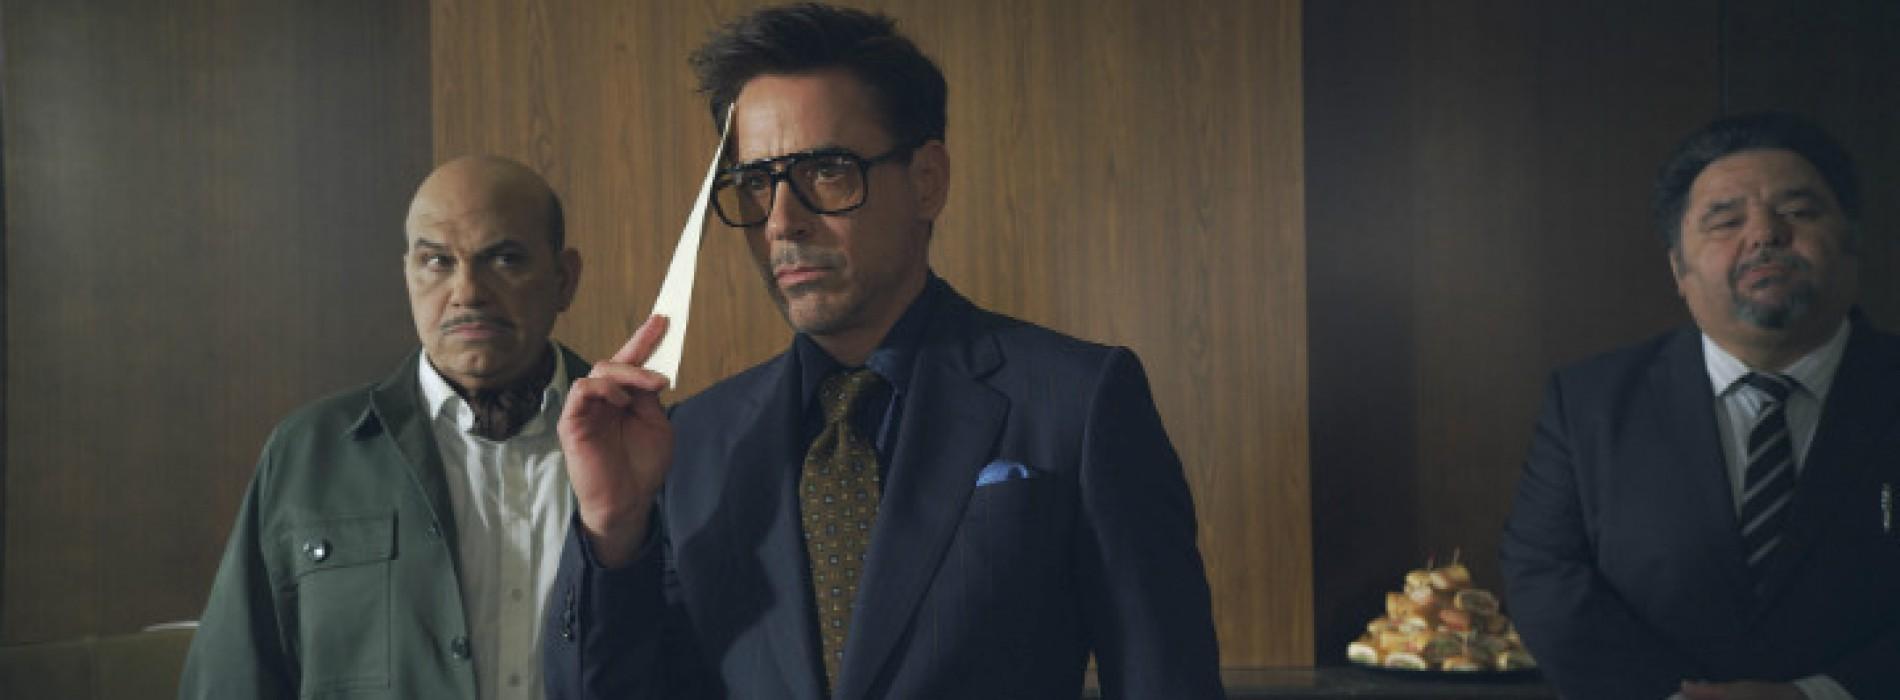 HTC unveils new 'Change' brand platform with Robert Downey Jr.